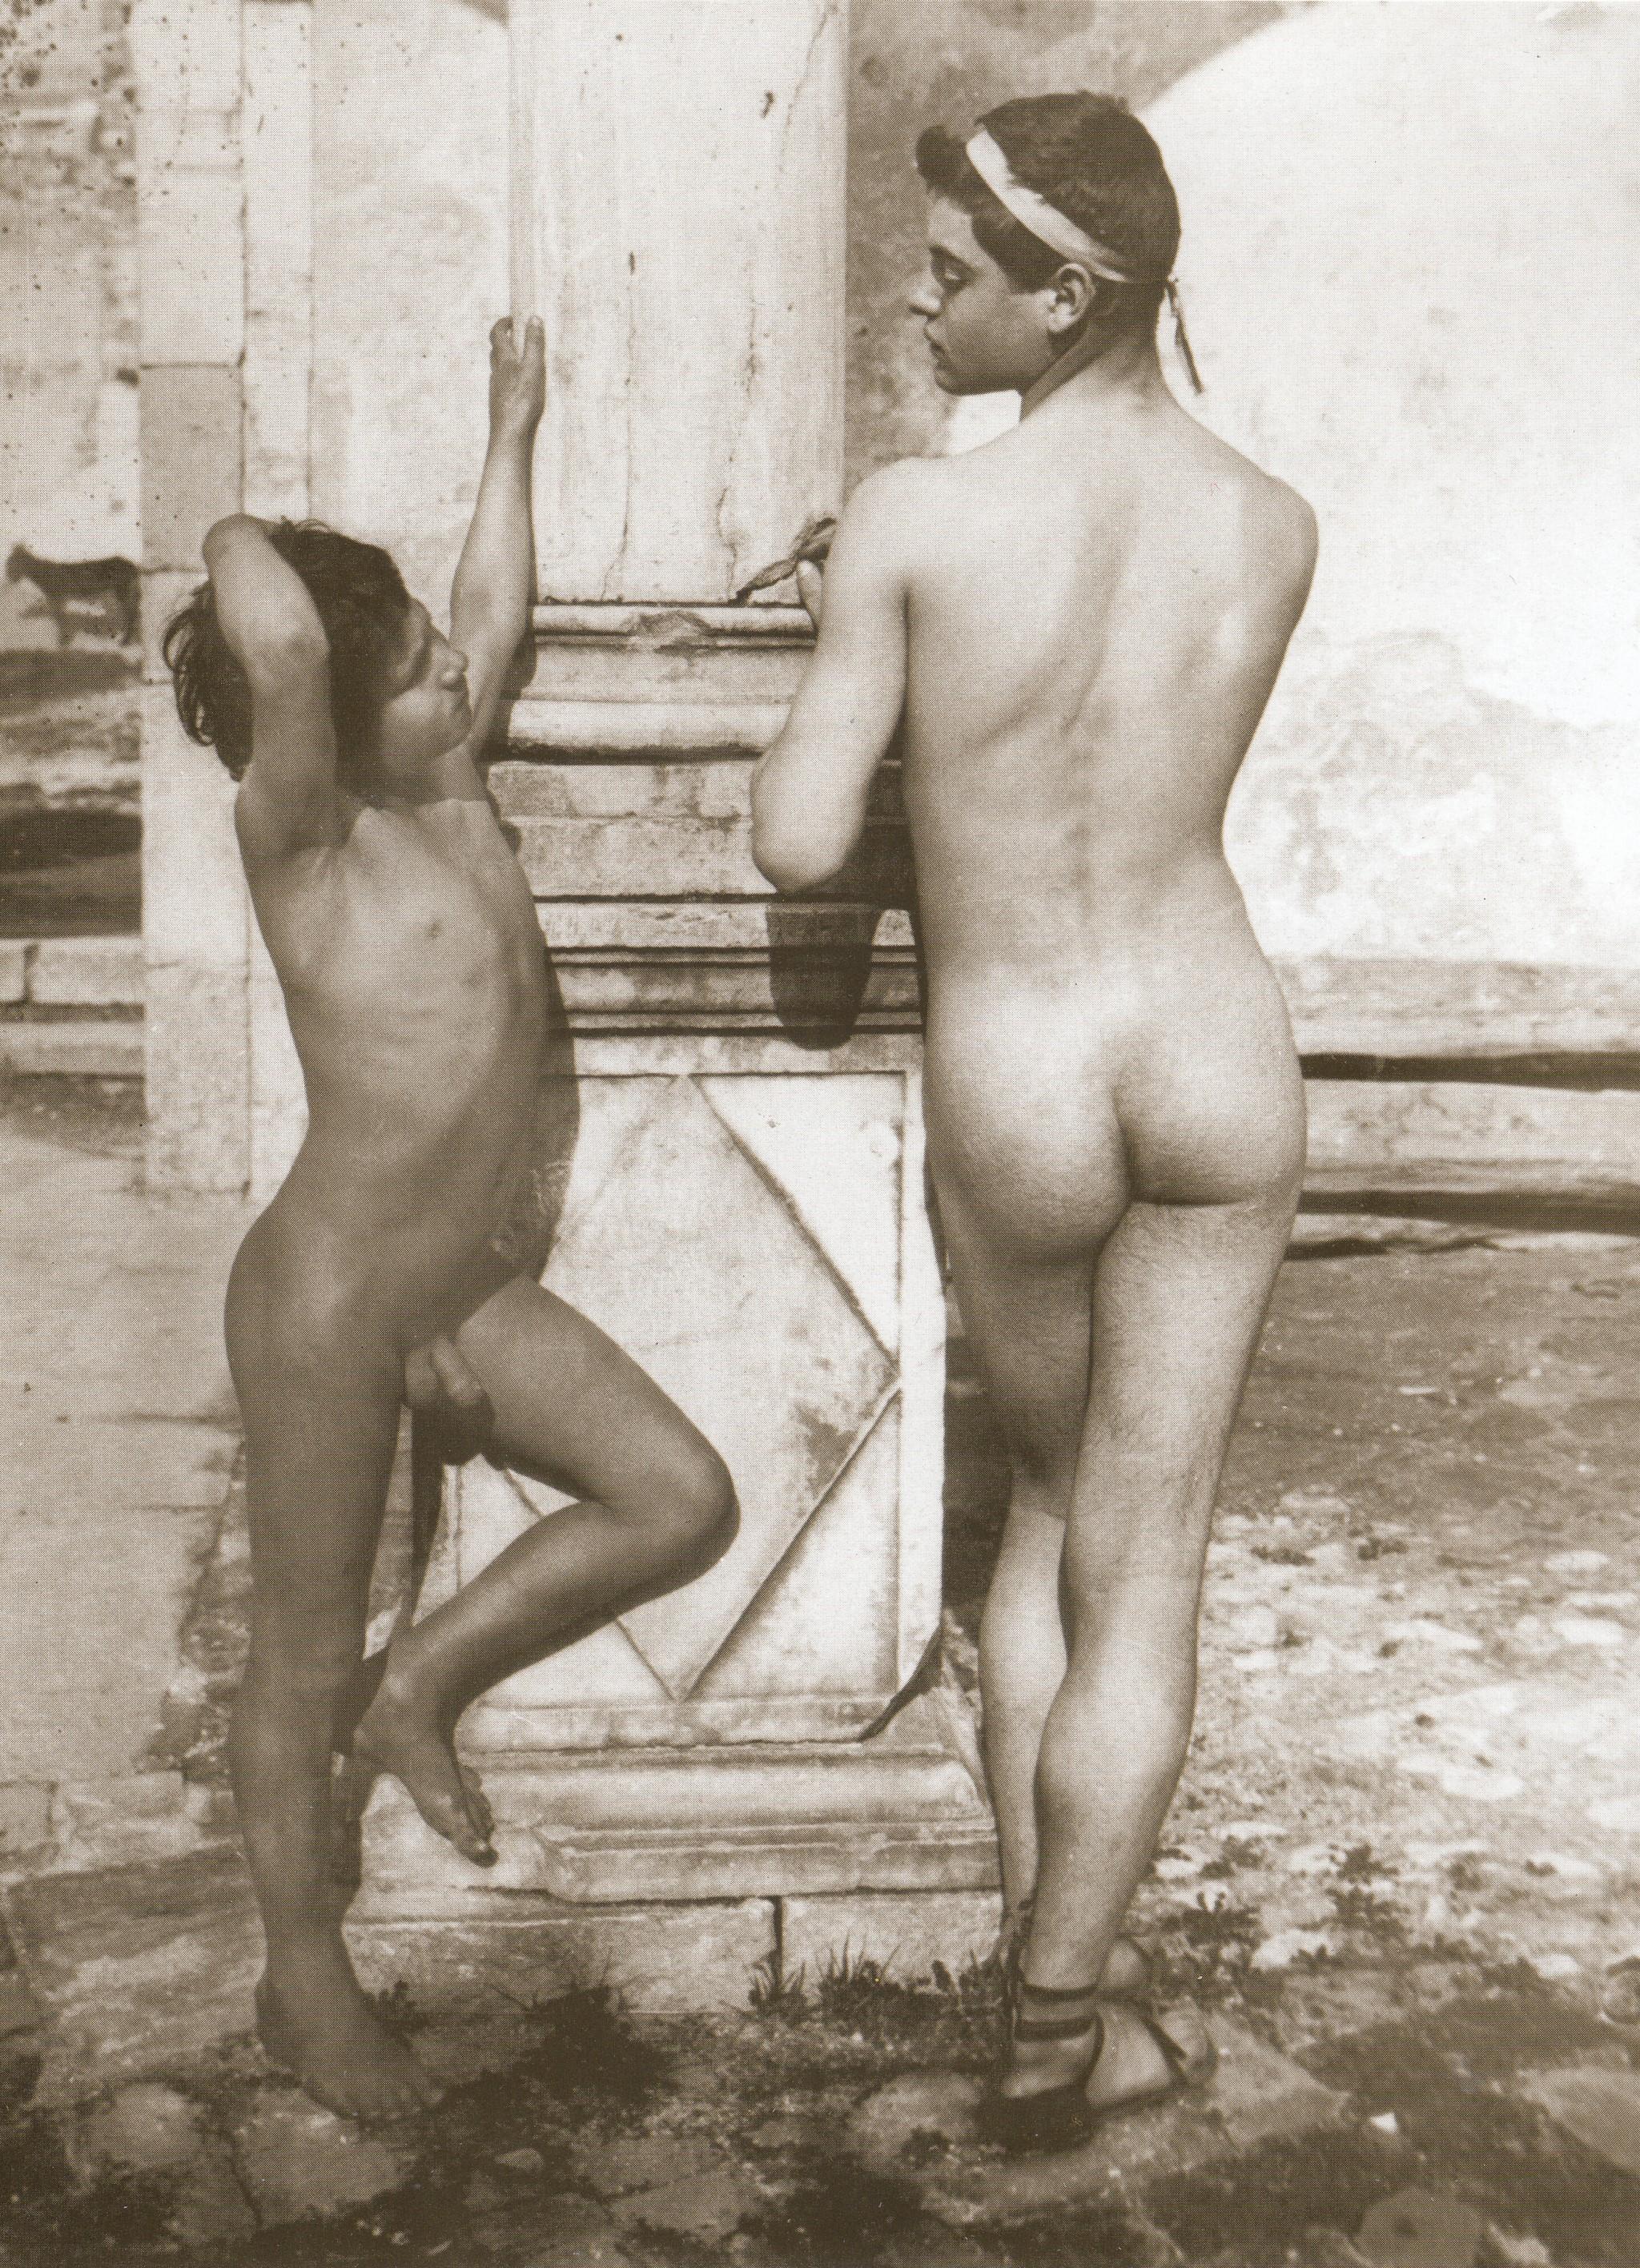 File:Gloeden, Wilhelm von (1856-1931) - n. 0253 - 1902-05 - Ragazzo con tenia - Twelvetrees p. 48.jpg